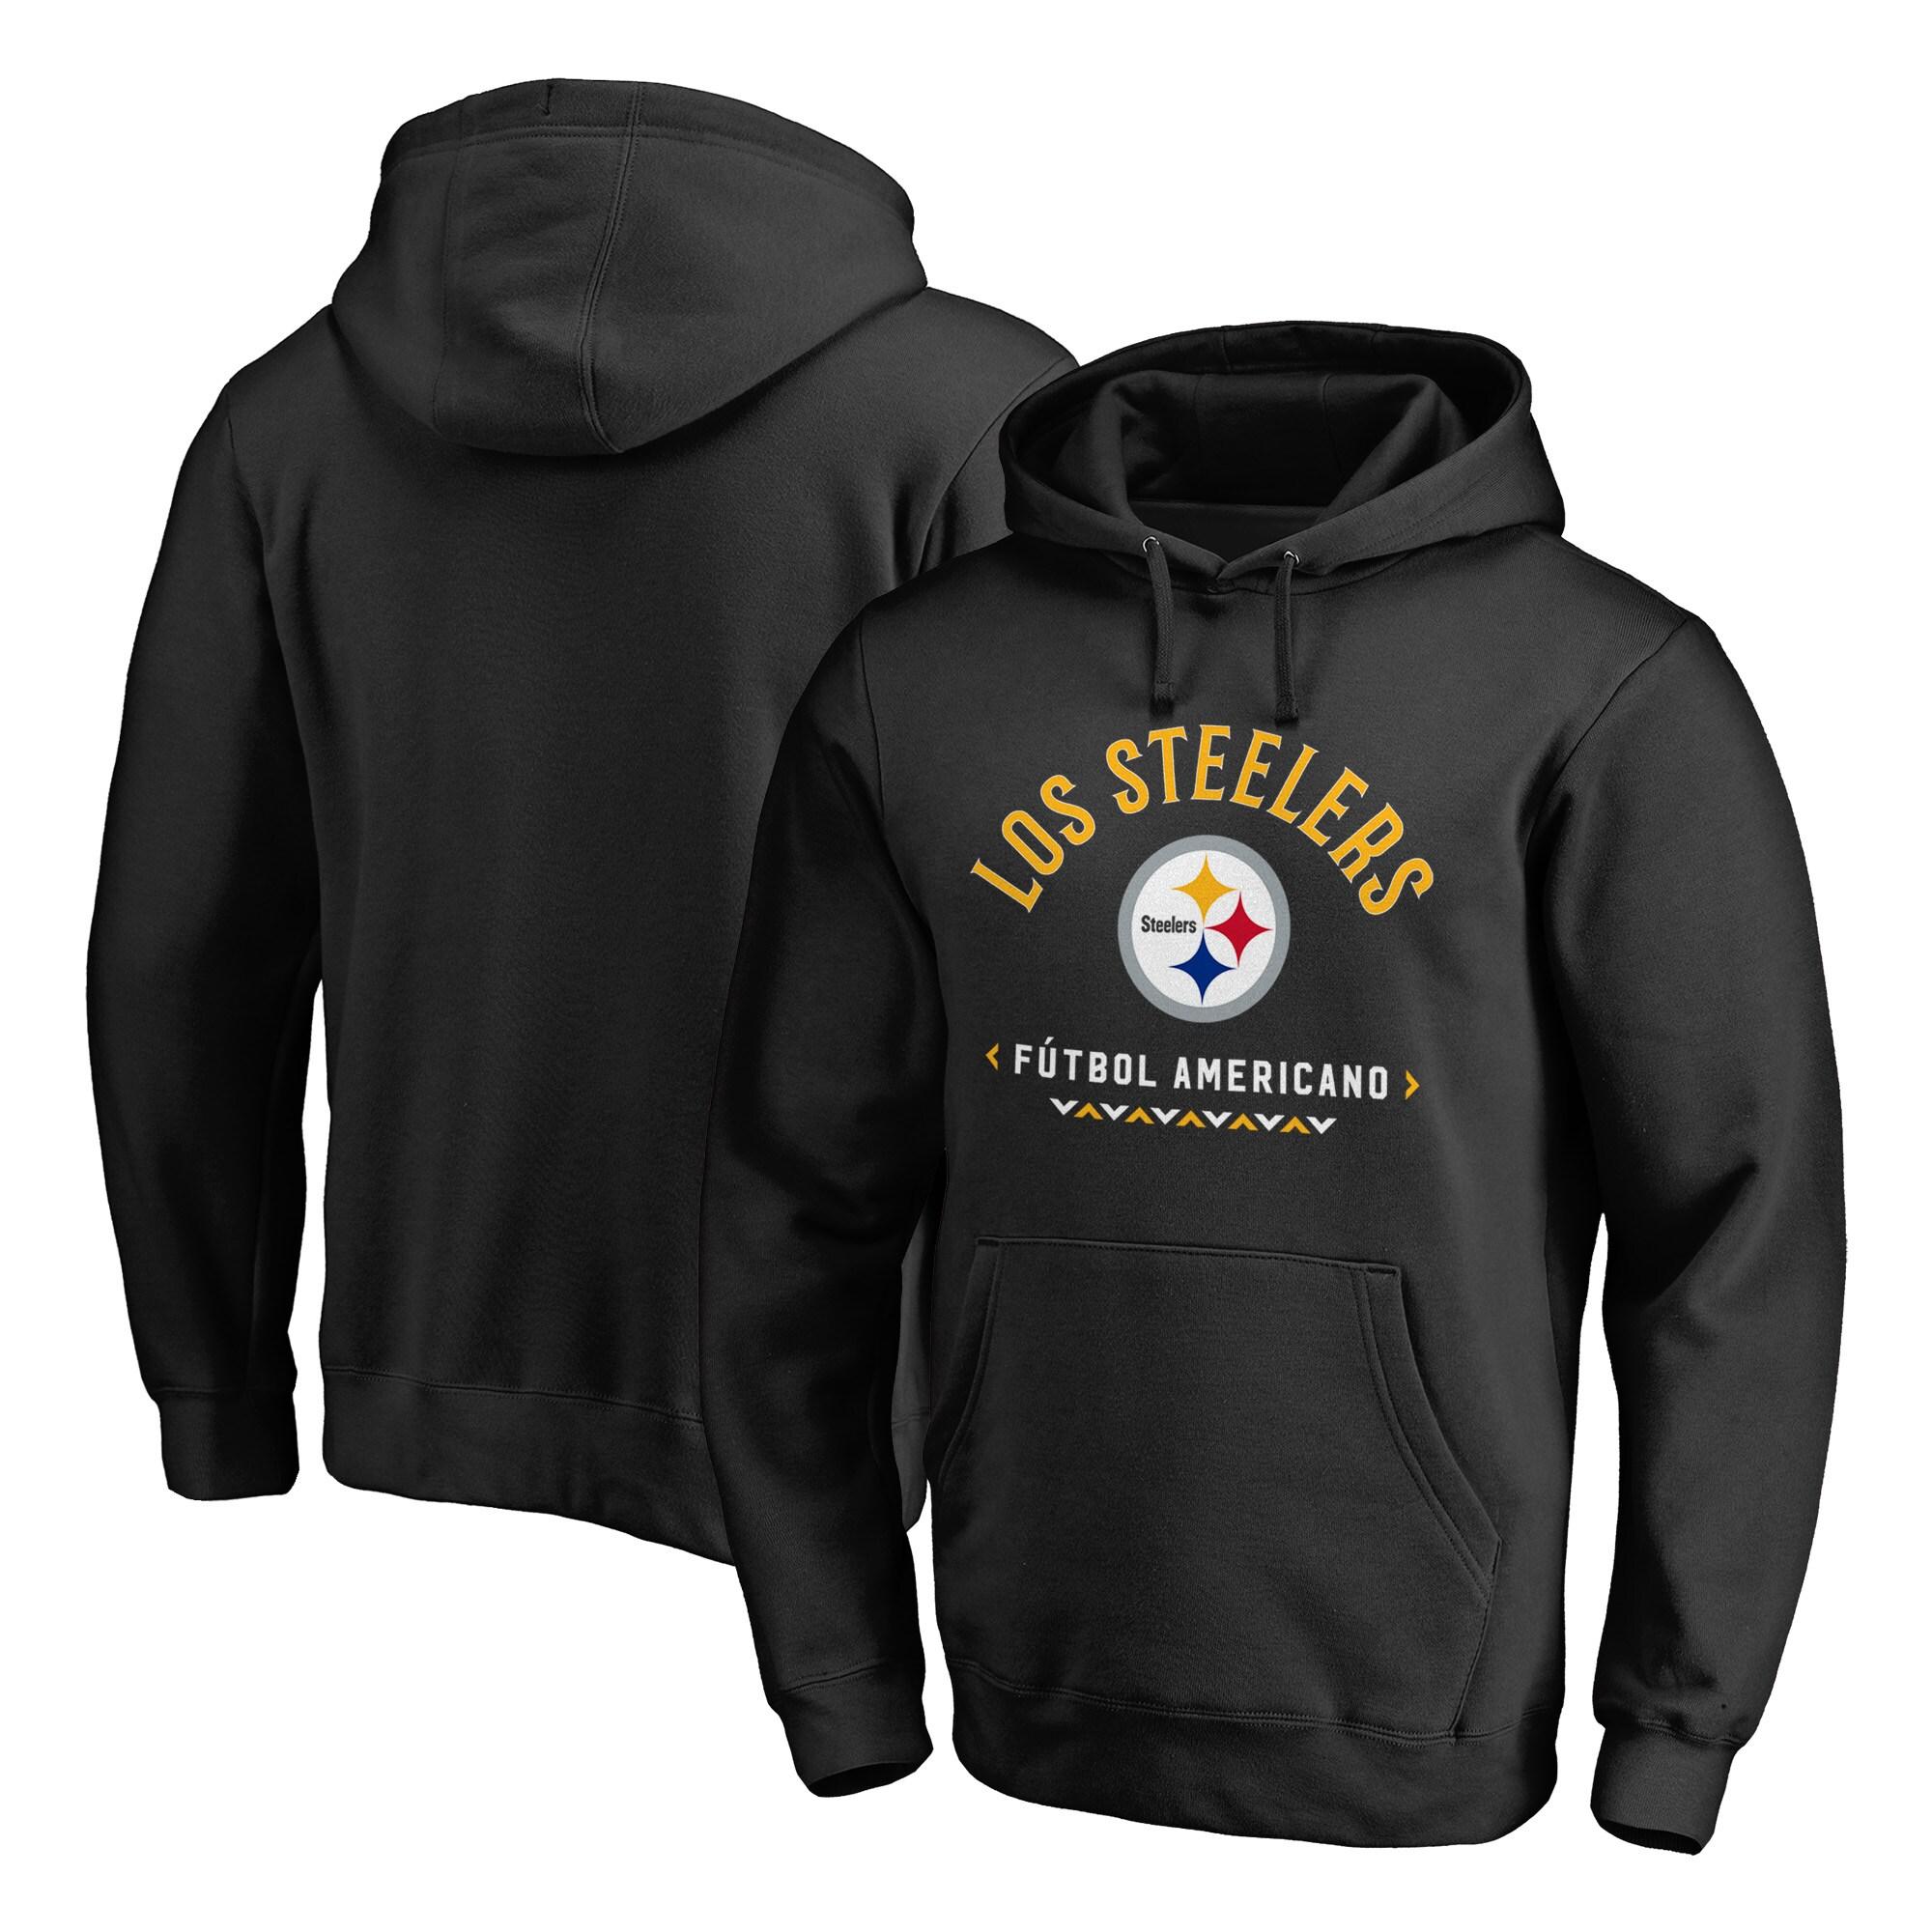 Pittsburgh Steelers NFL Pro Line by Fanatics Branded Futbol Americano Pullover Hoodie - Black